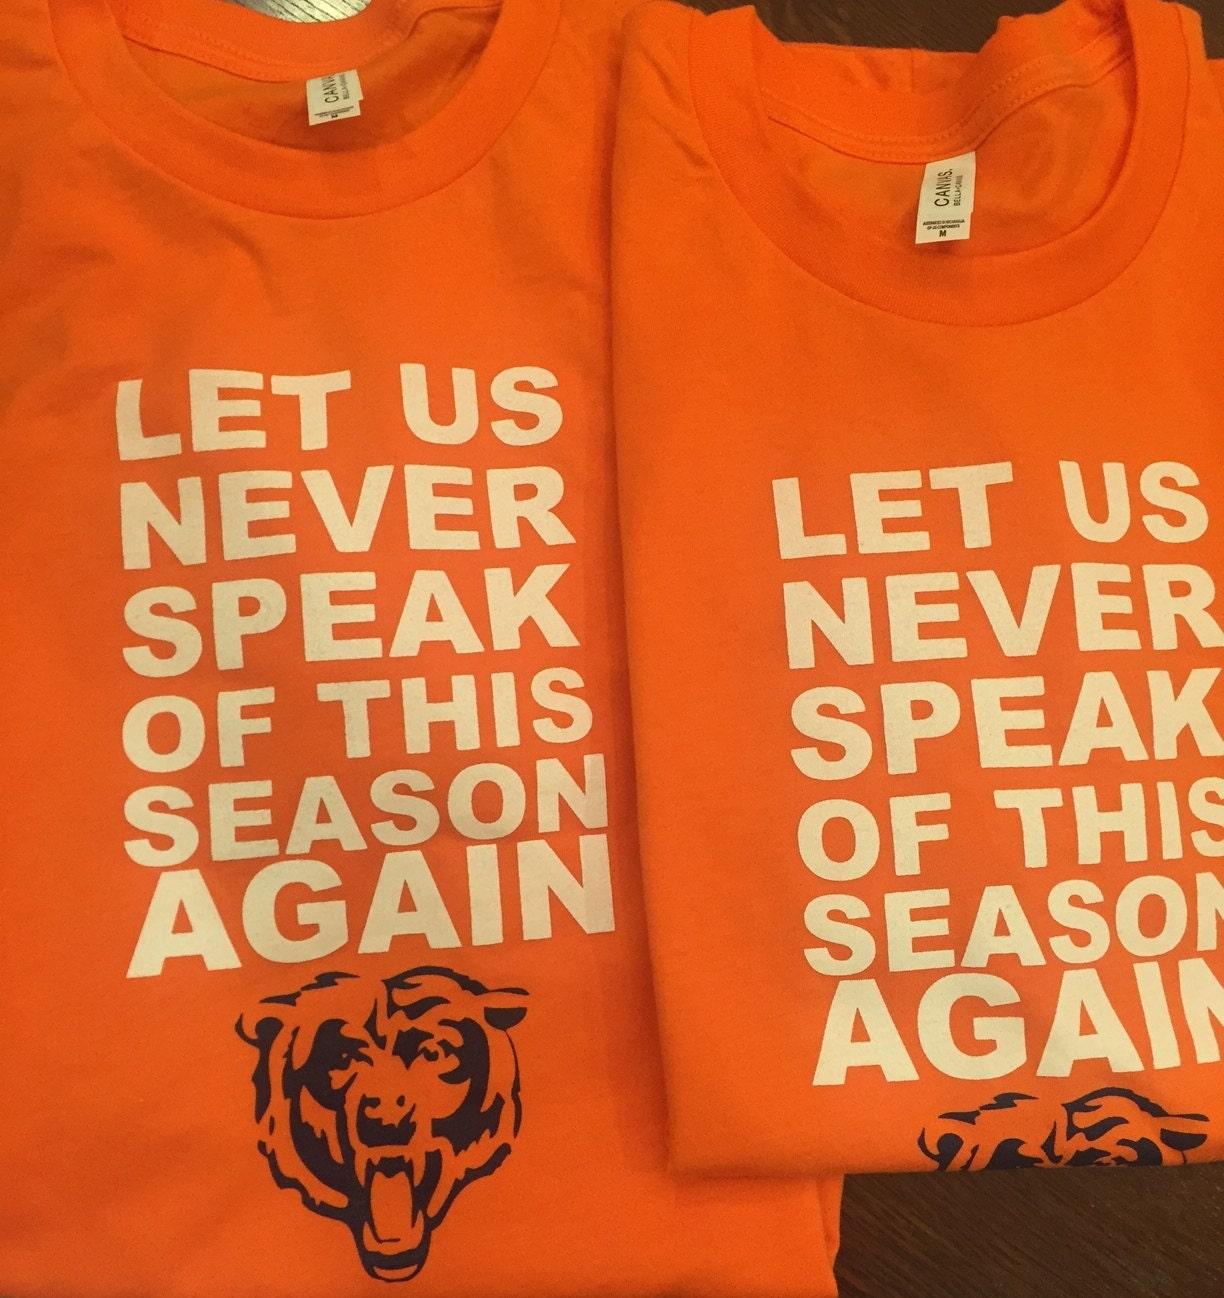 best website 462af ce750 Clearance! Chicago Bears Let us never speak of this season ...